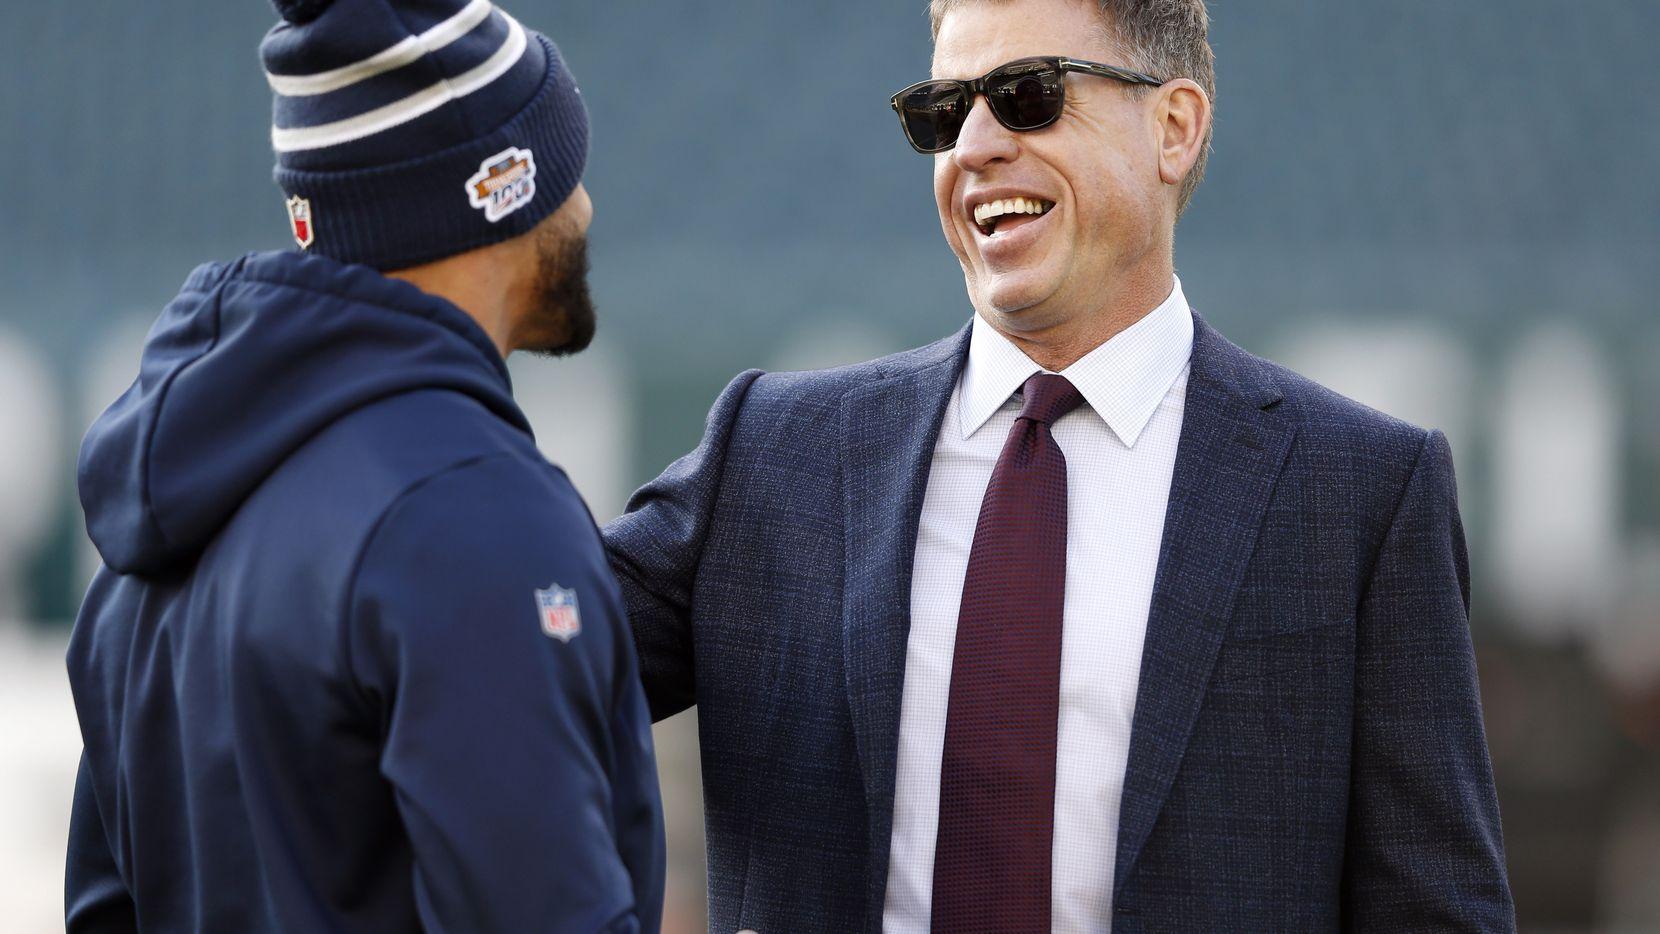 Dallas Cowboys quarterback Dak Prescott (4) shares a laugh with former Dallas Cowboys quarterback Troy Aikman before a game against the Philadelphia Eagles at Lincoln Financial Field in Philadelphia on Sunday, December 22, 2019.